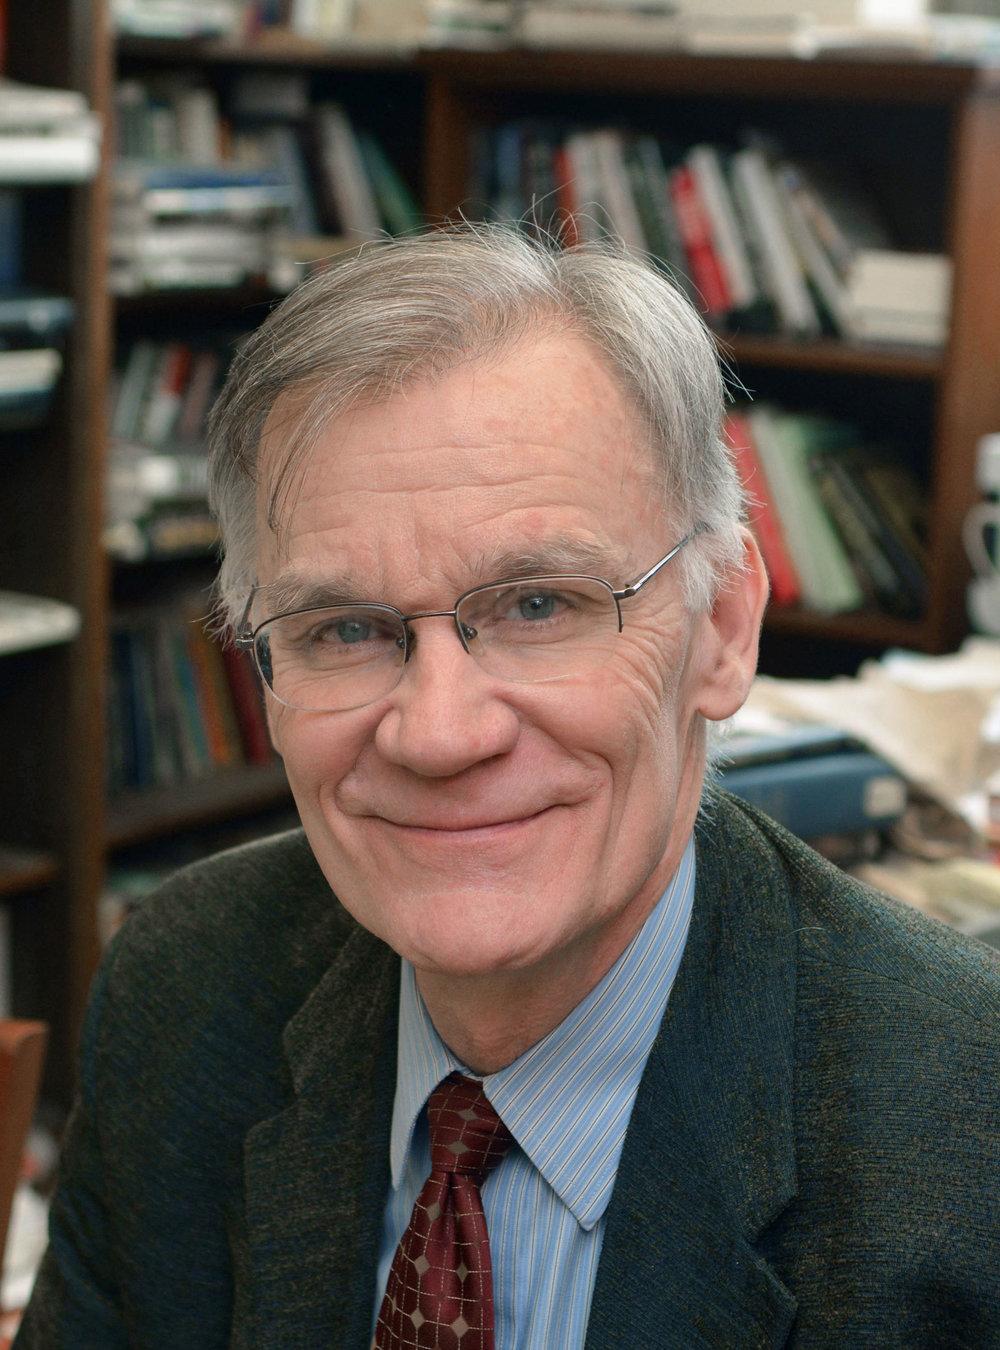 David Blight, Yale University